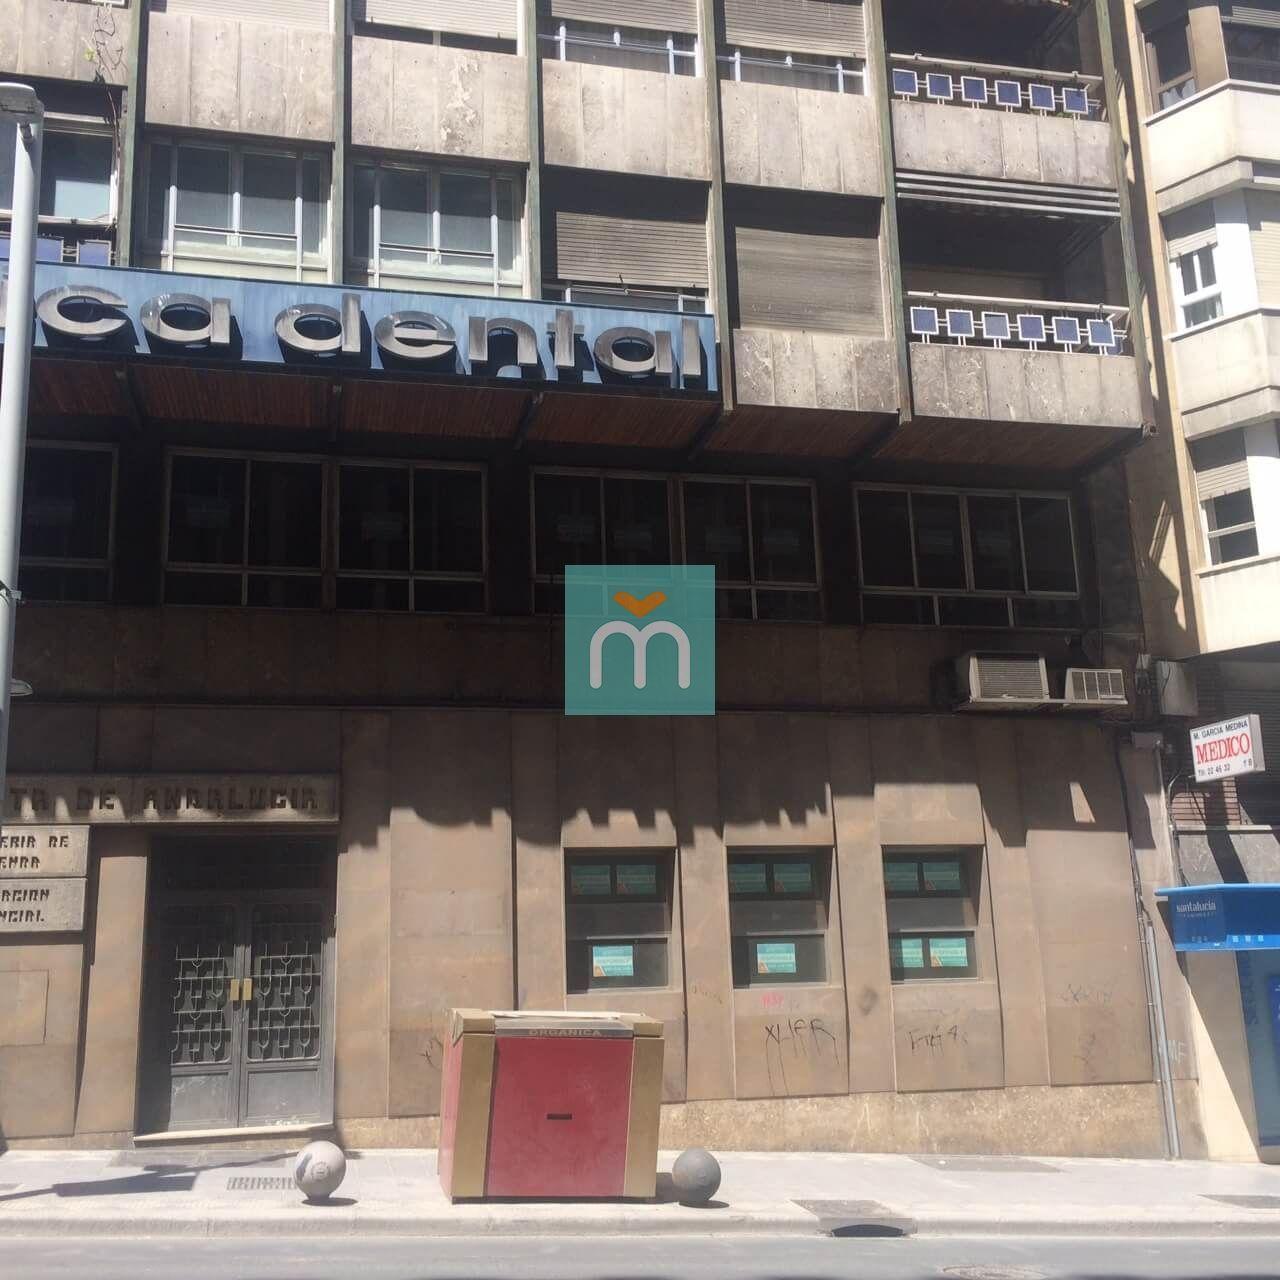 Local Rent Homes: Local Rent Jaén Yainmo-112